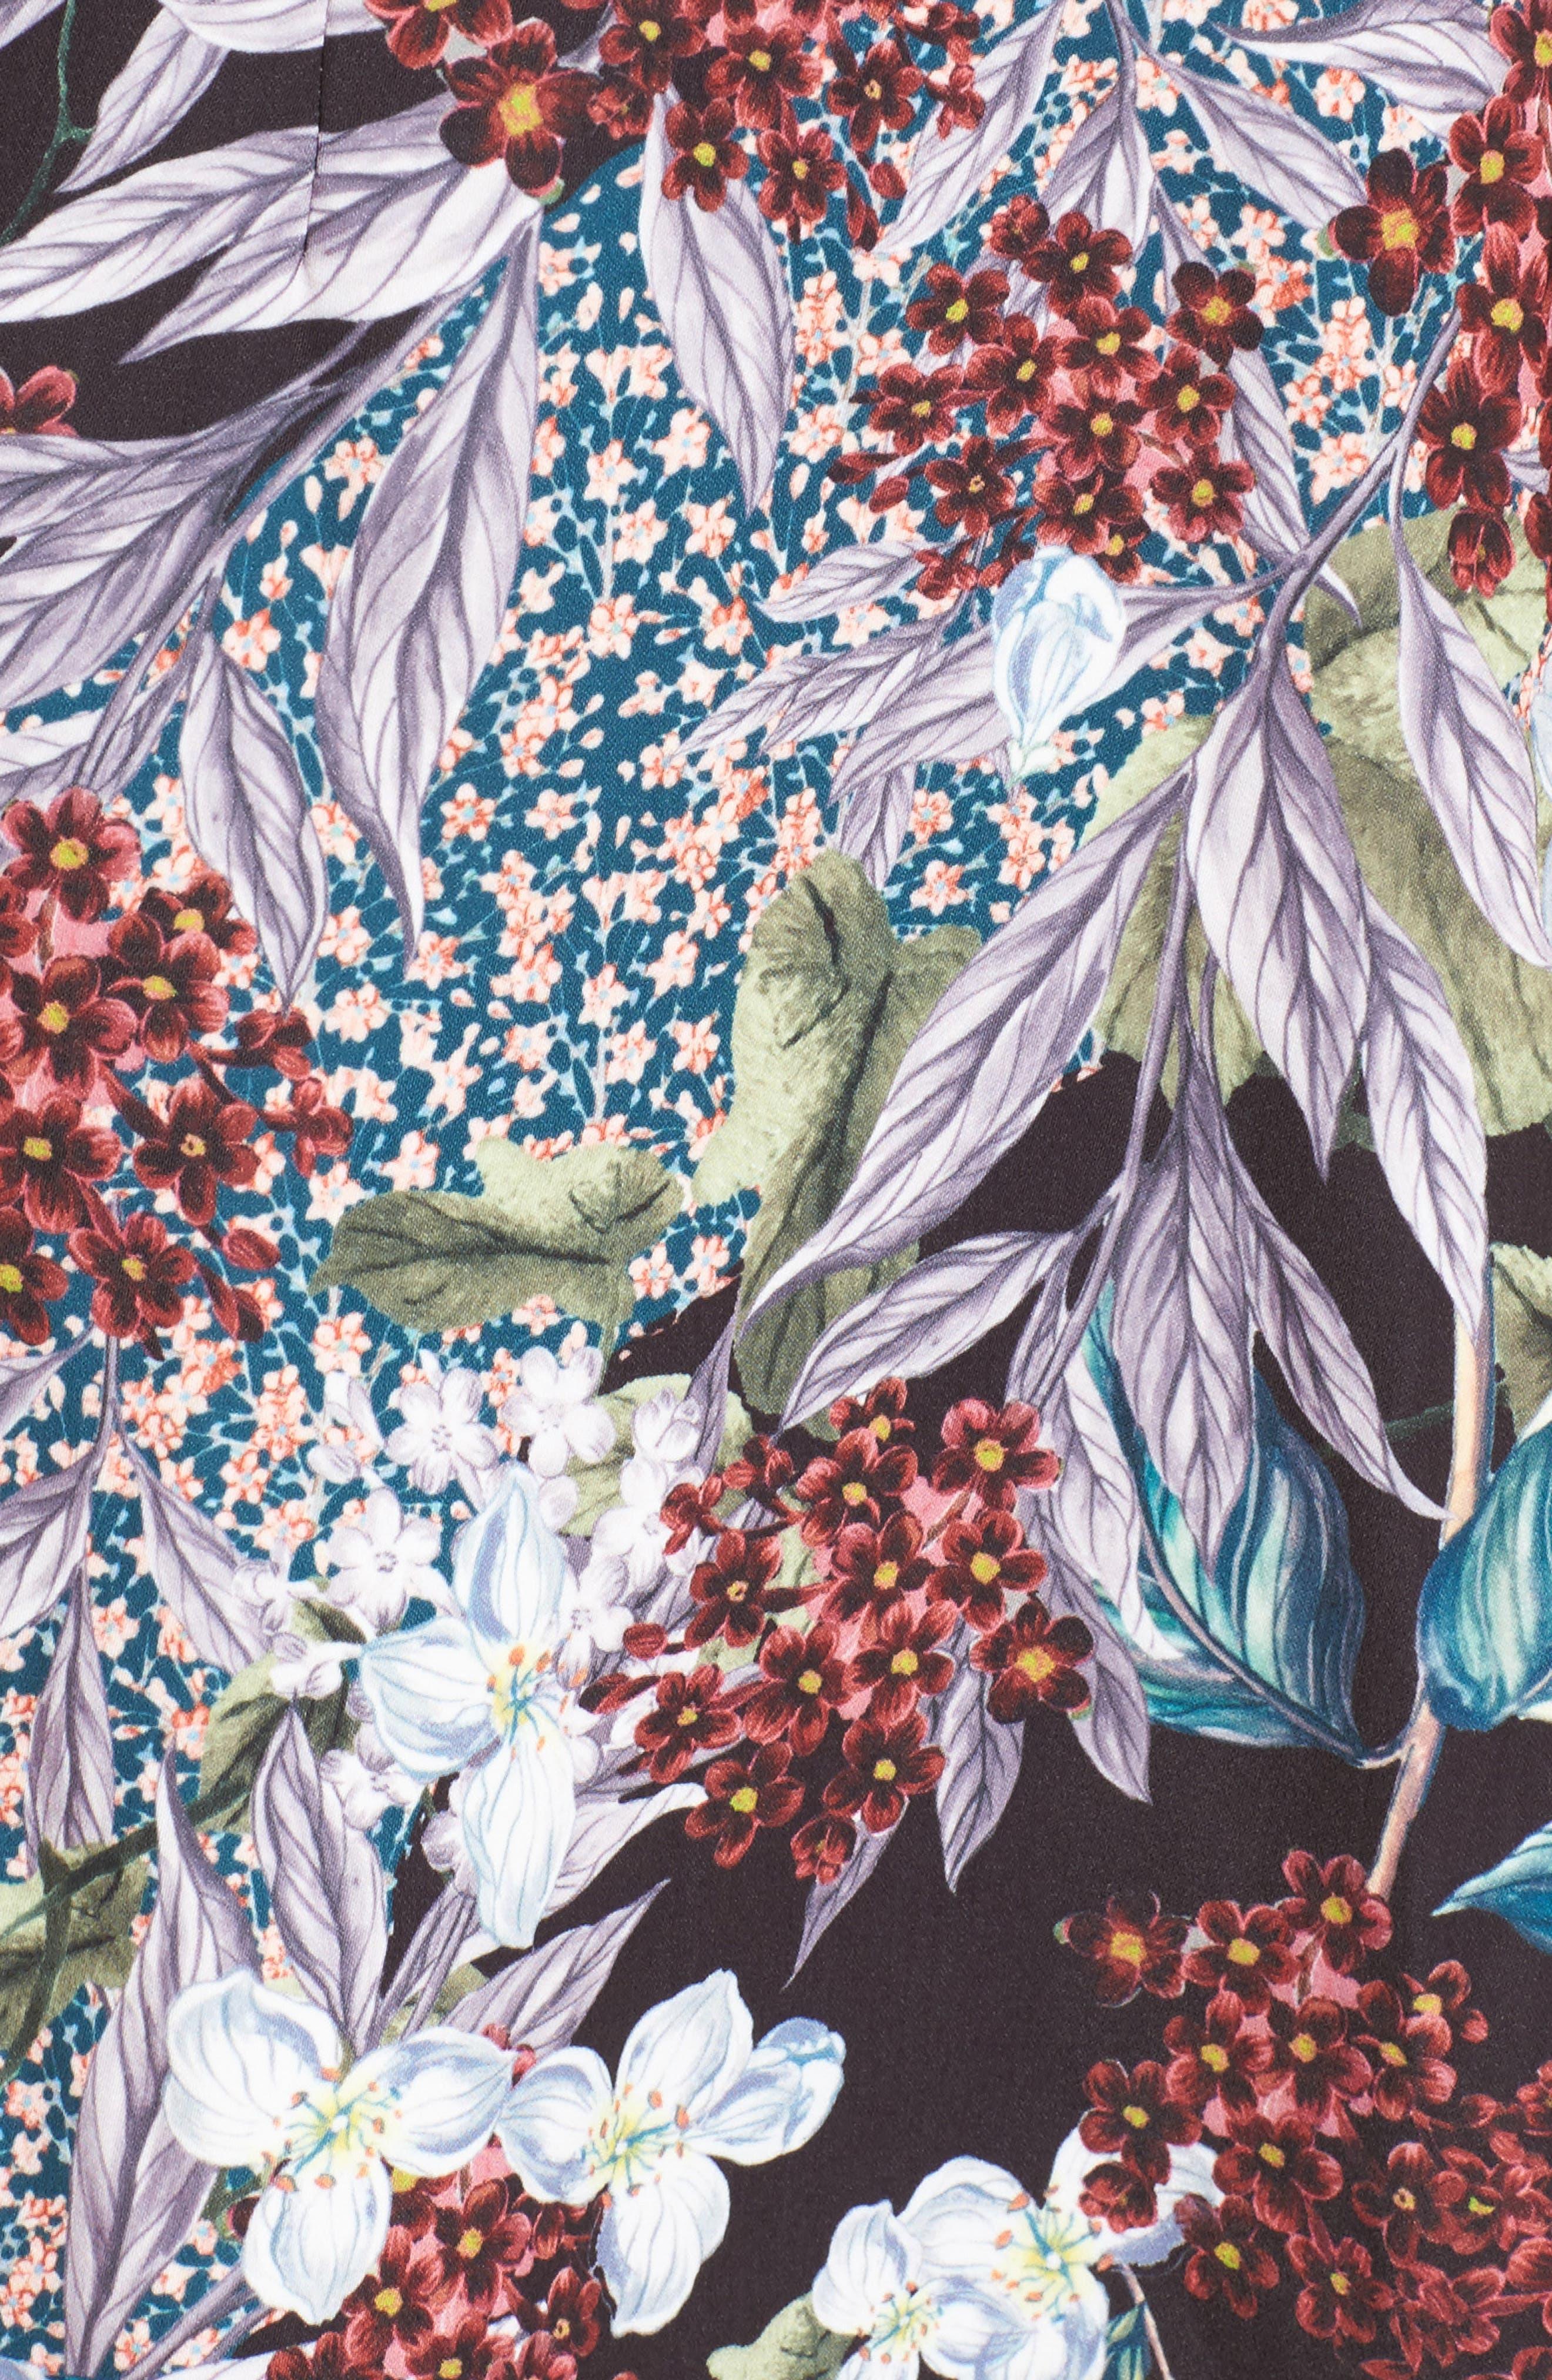 Lost Dreams Minidress,                             Alternate thumbnail 6, color,                             Multi Floral